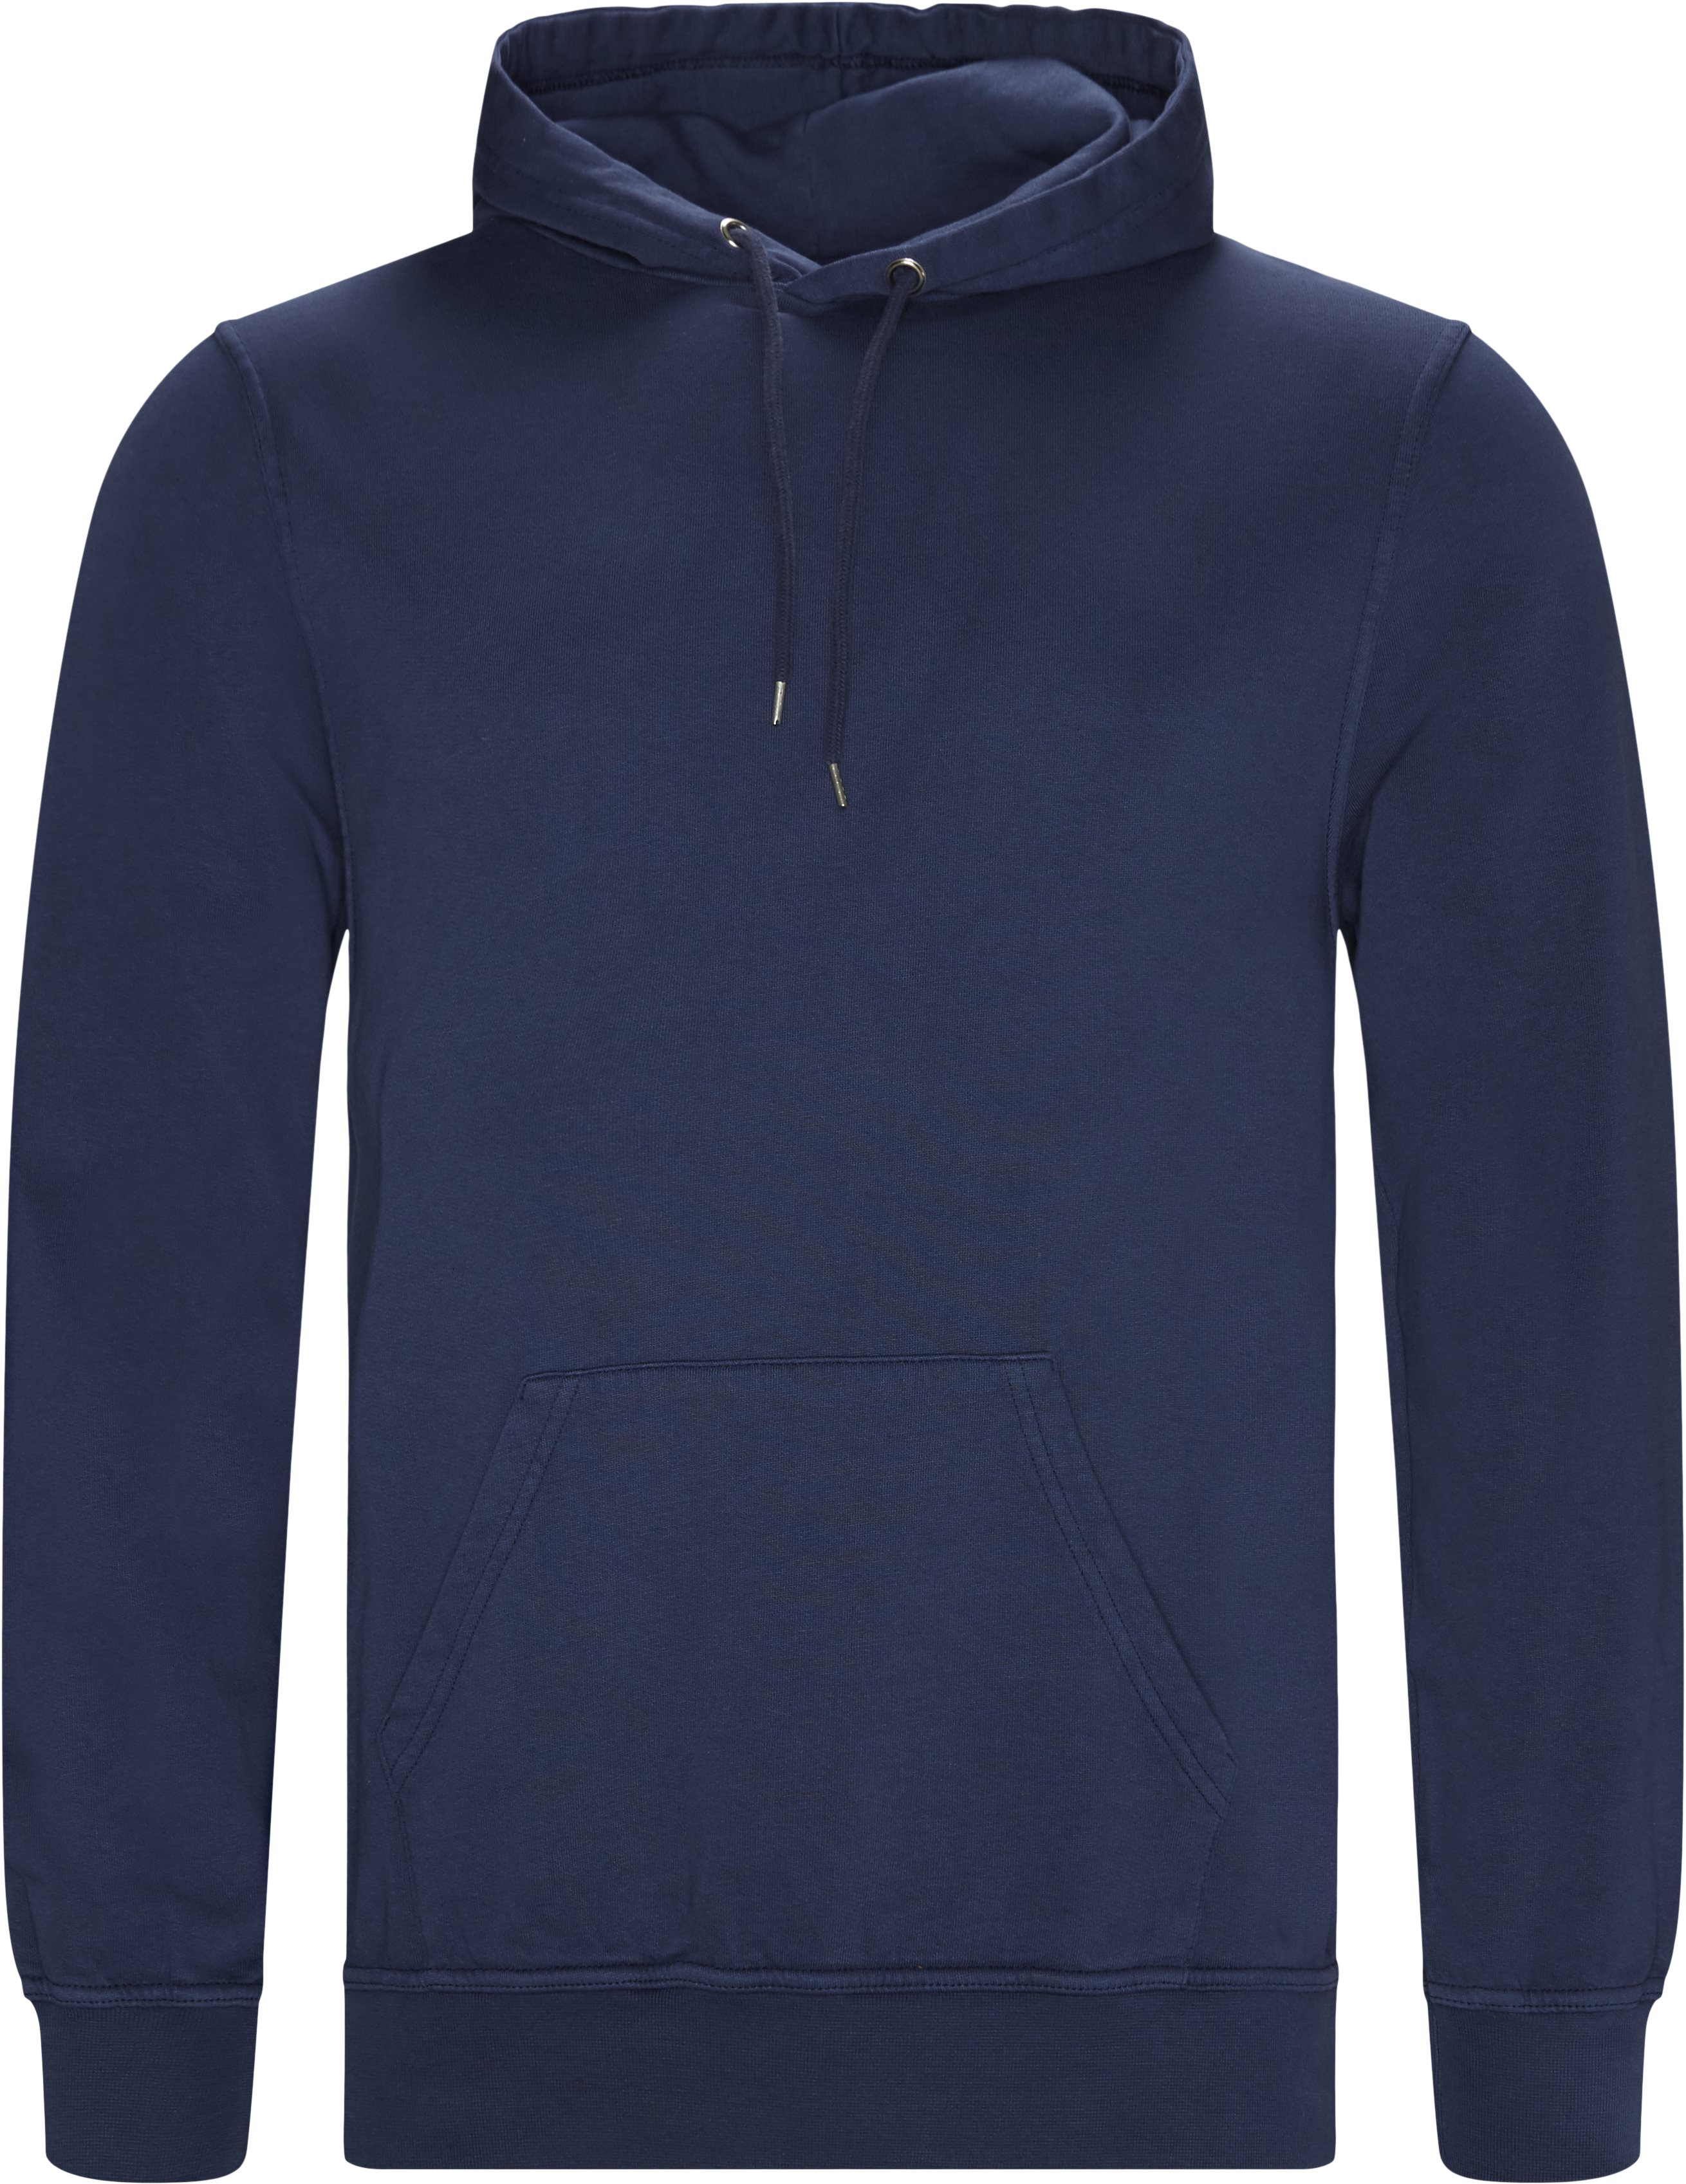 Douro Hoodie - Sweatshirts - Regular fit - Blå